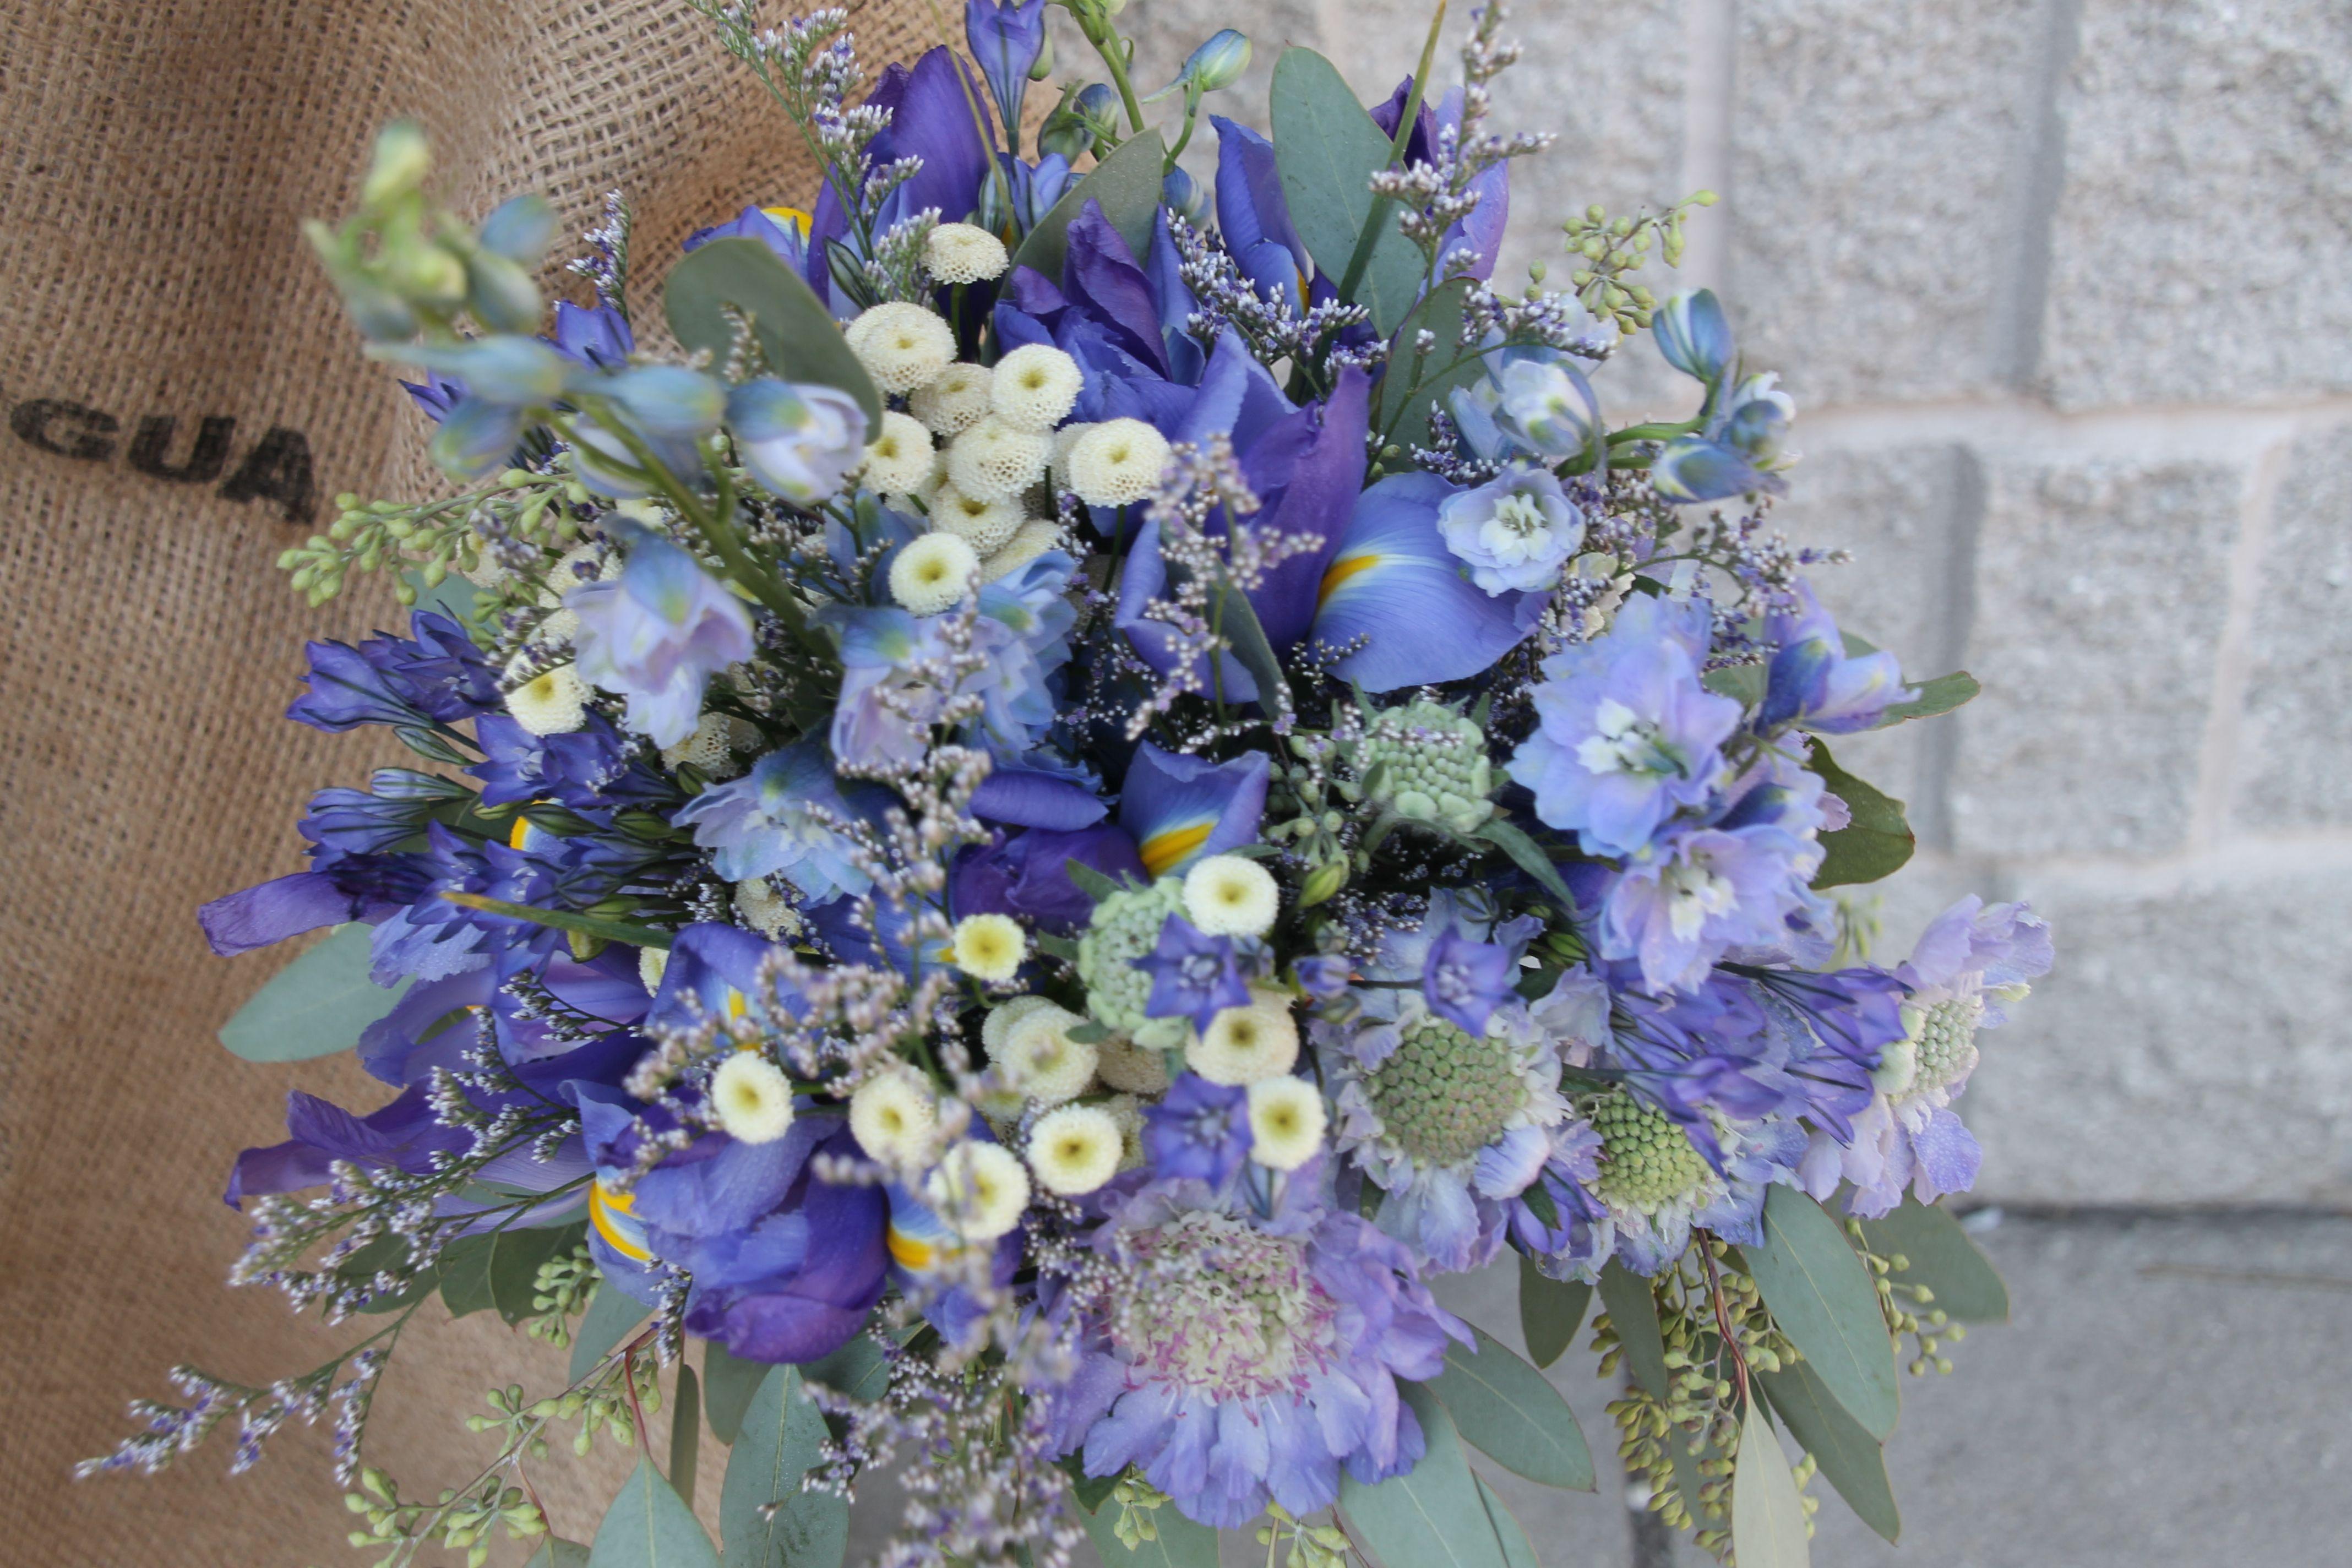 Blue Delphinium Blue Iris Bluelavender Scabiosa Flower Mini